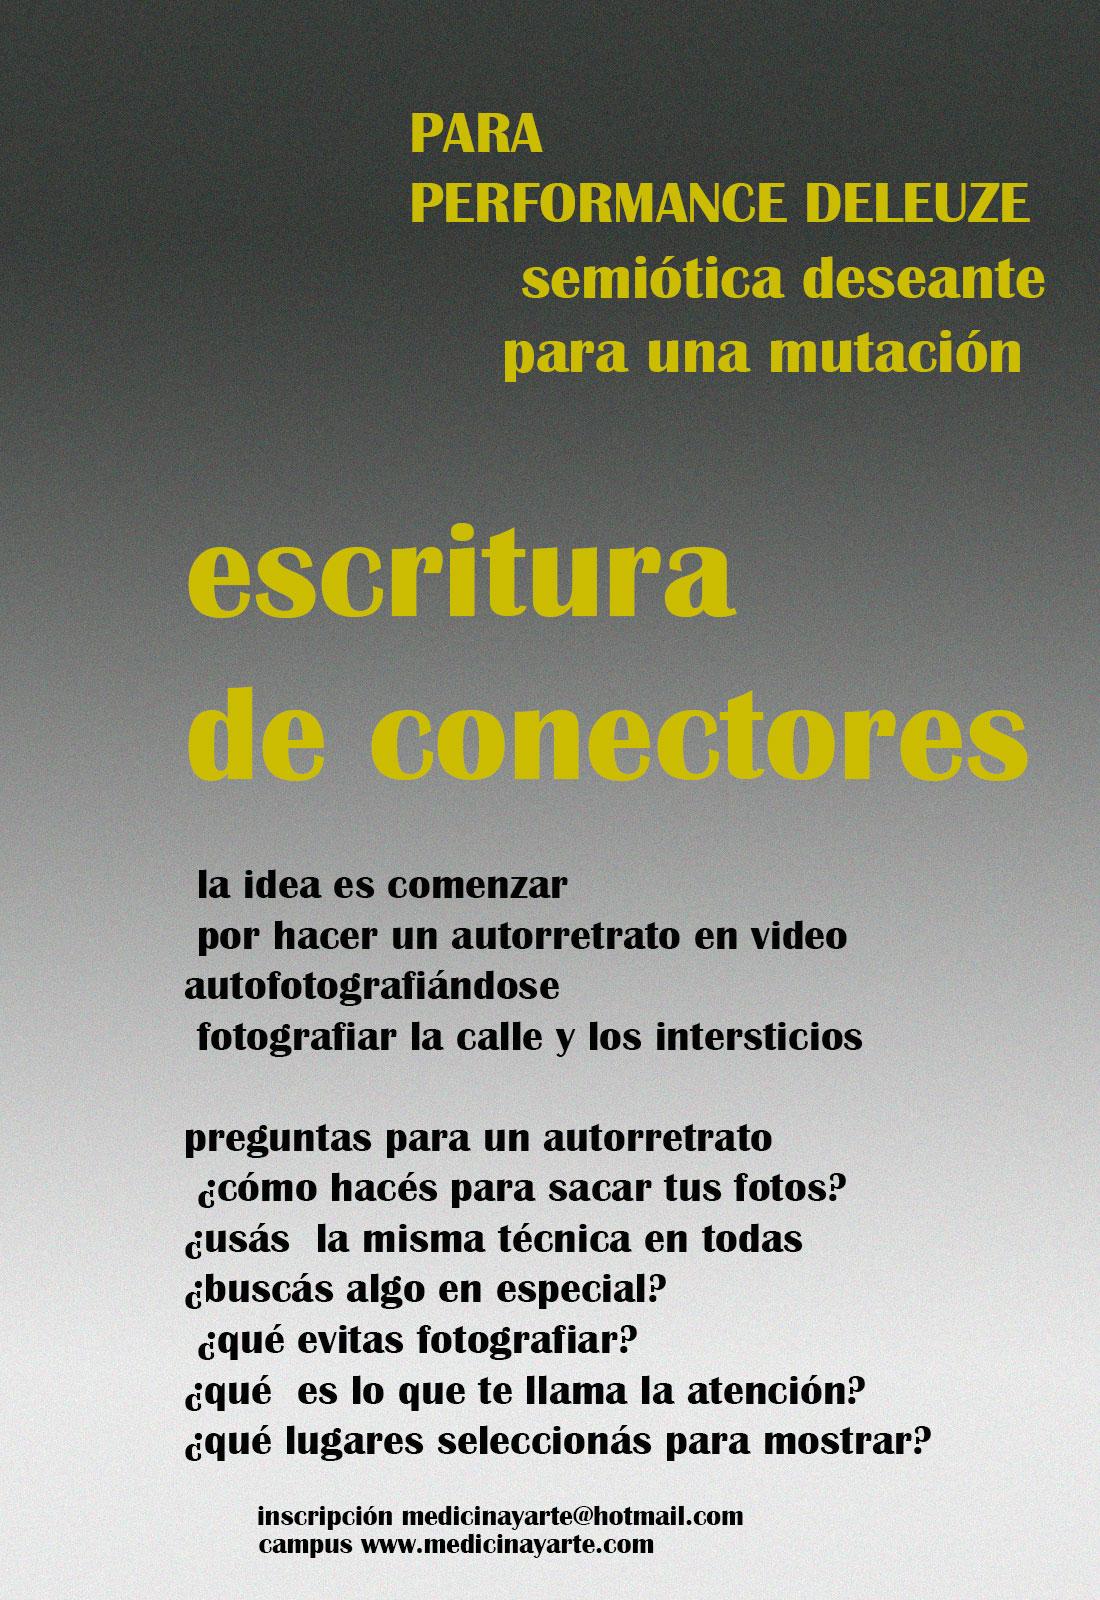 http://www.medicinayarte.com/img/escritura-de-conect.jpg